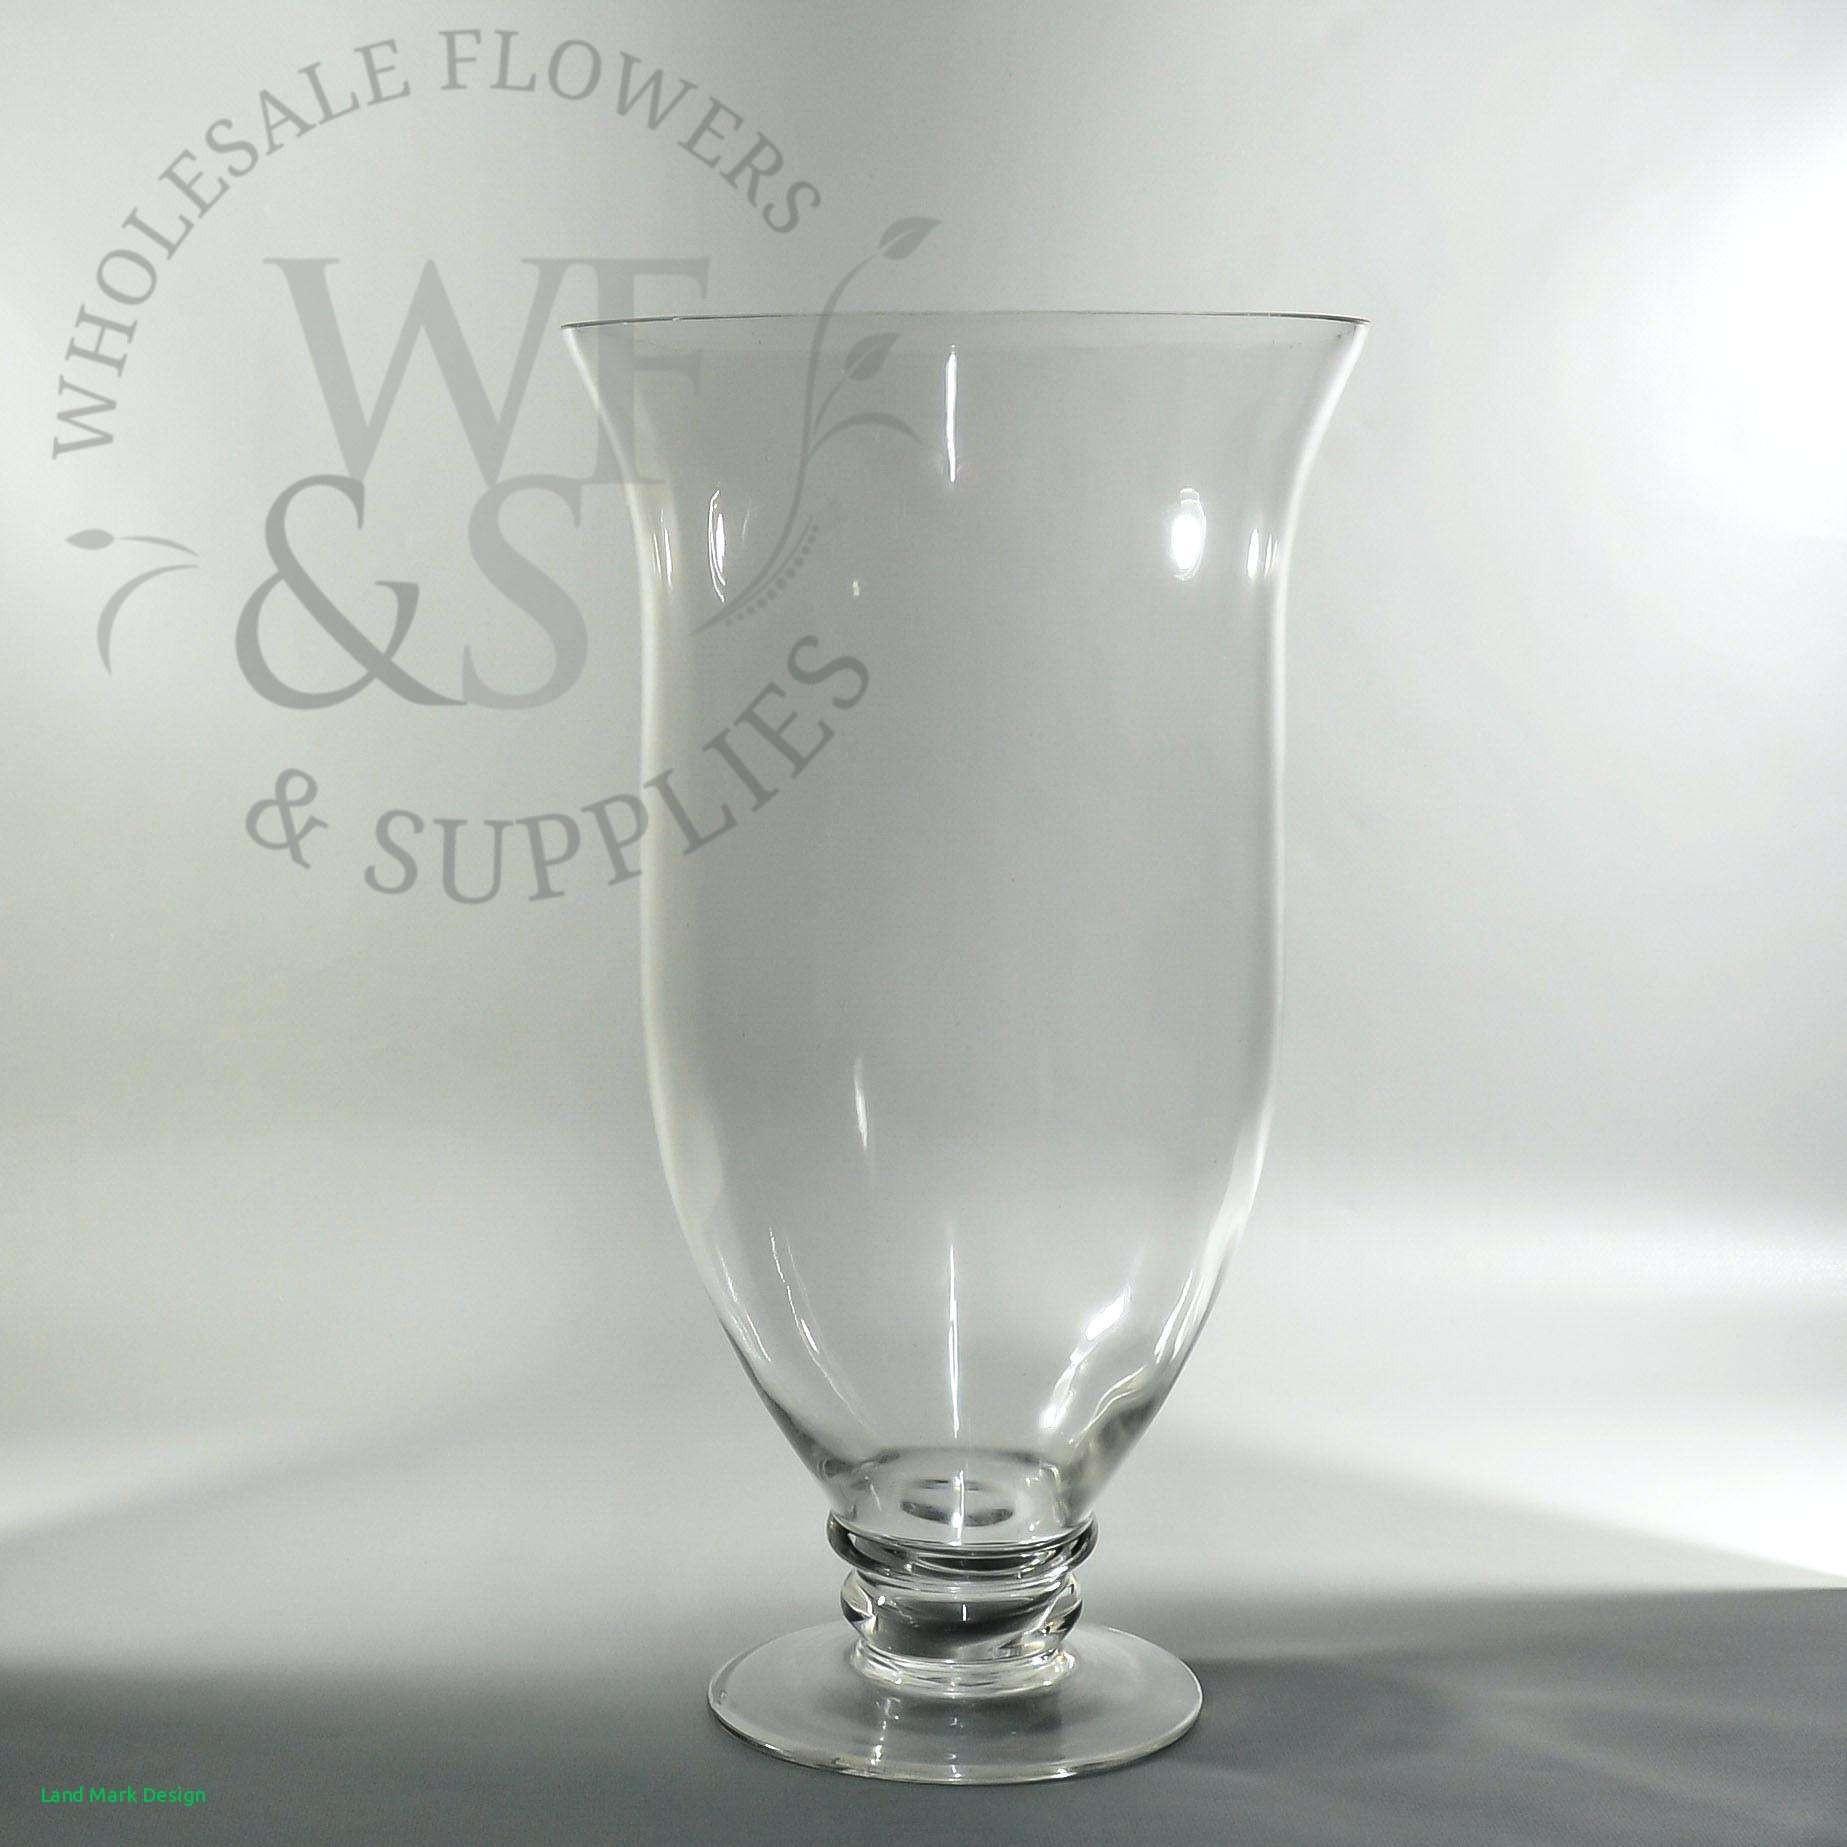 large rustic vase of large glass vases image glass vase ideas design vases artificial throughout large glass vases image glass vase ideas design of large glass vases image glass vase ideas